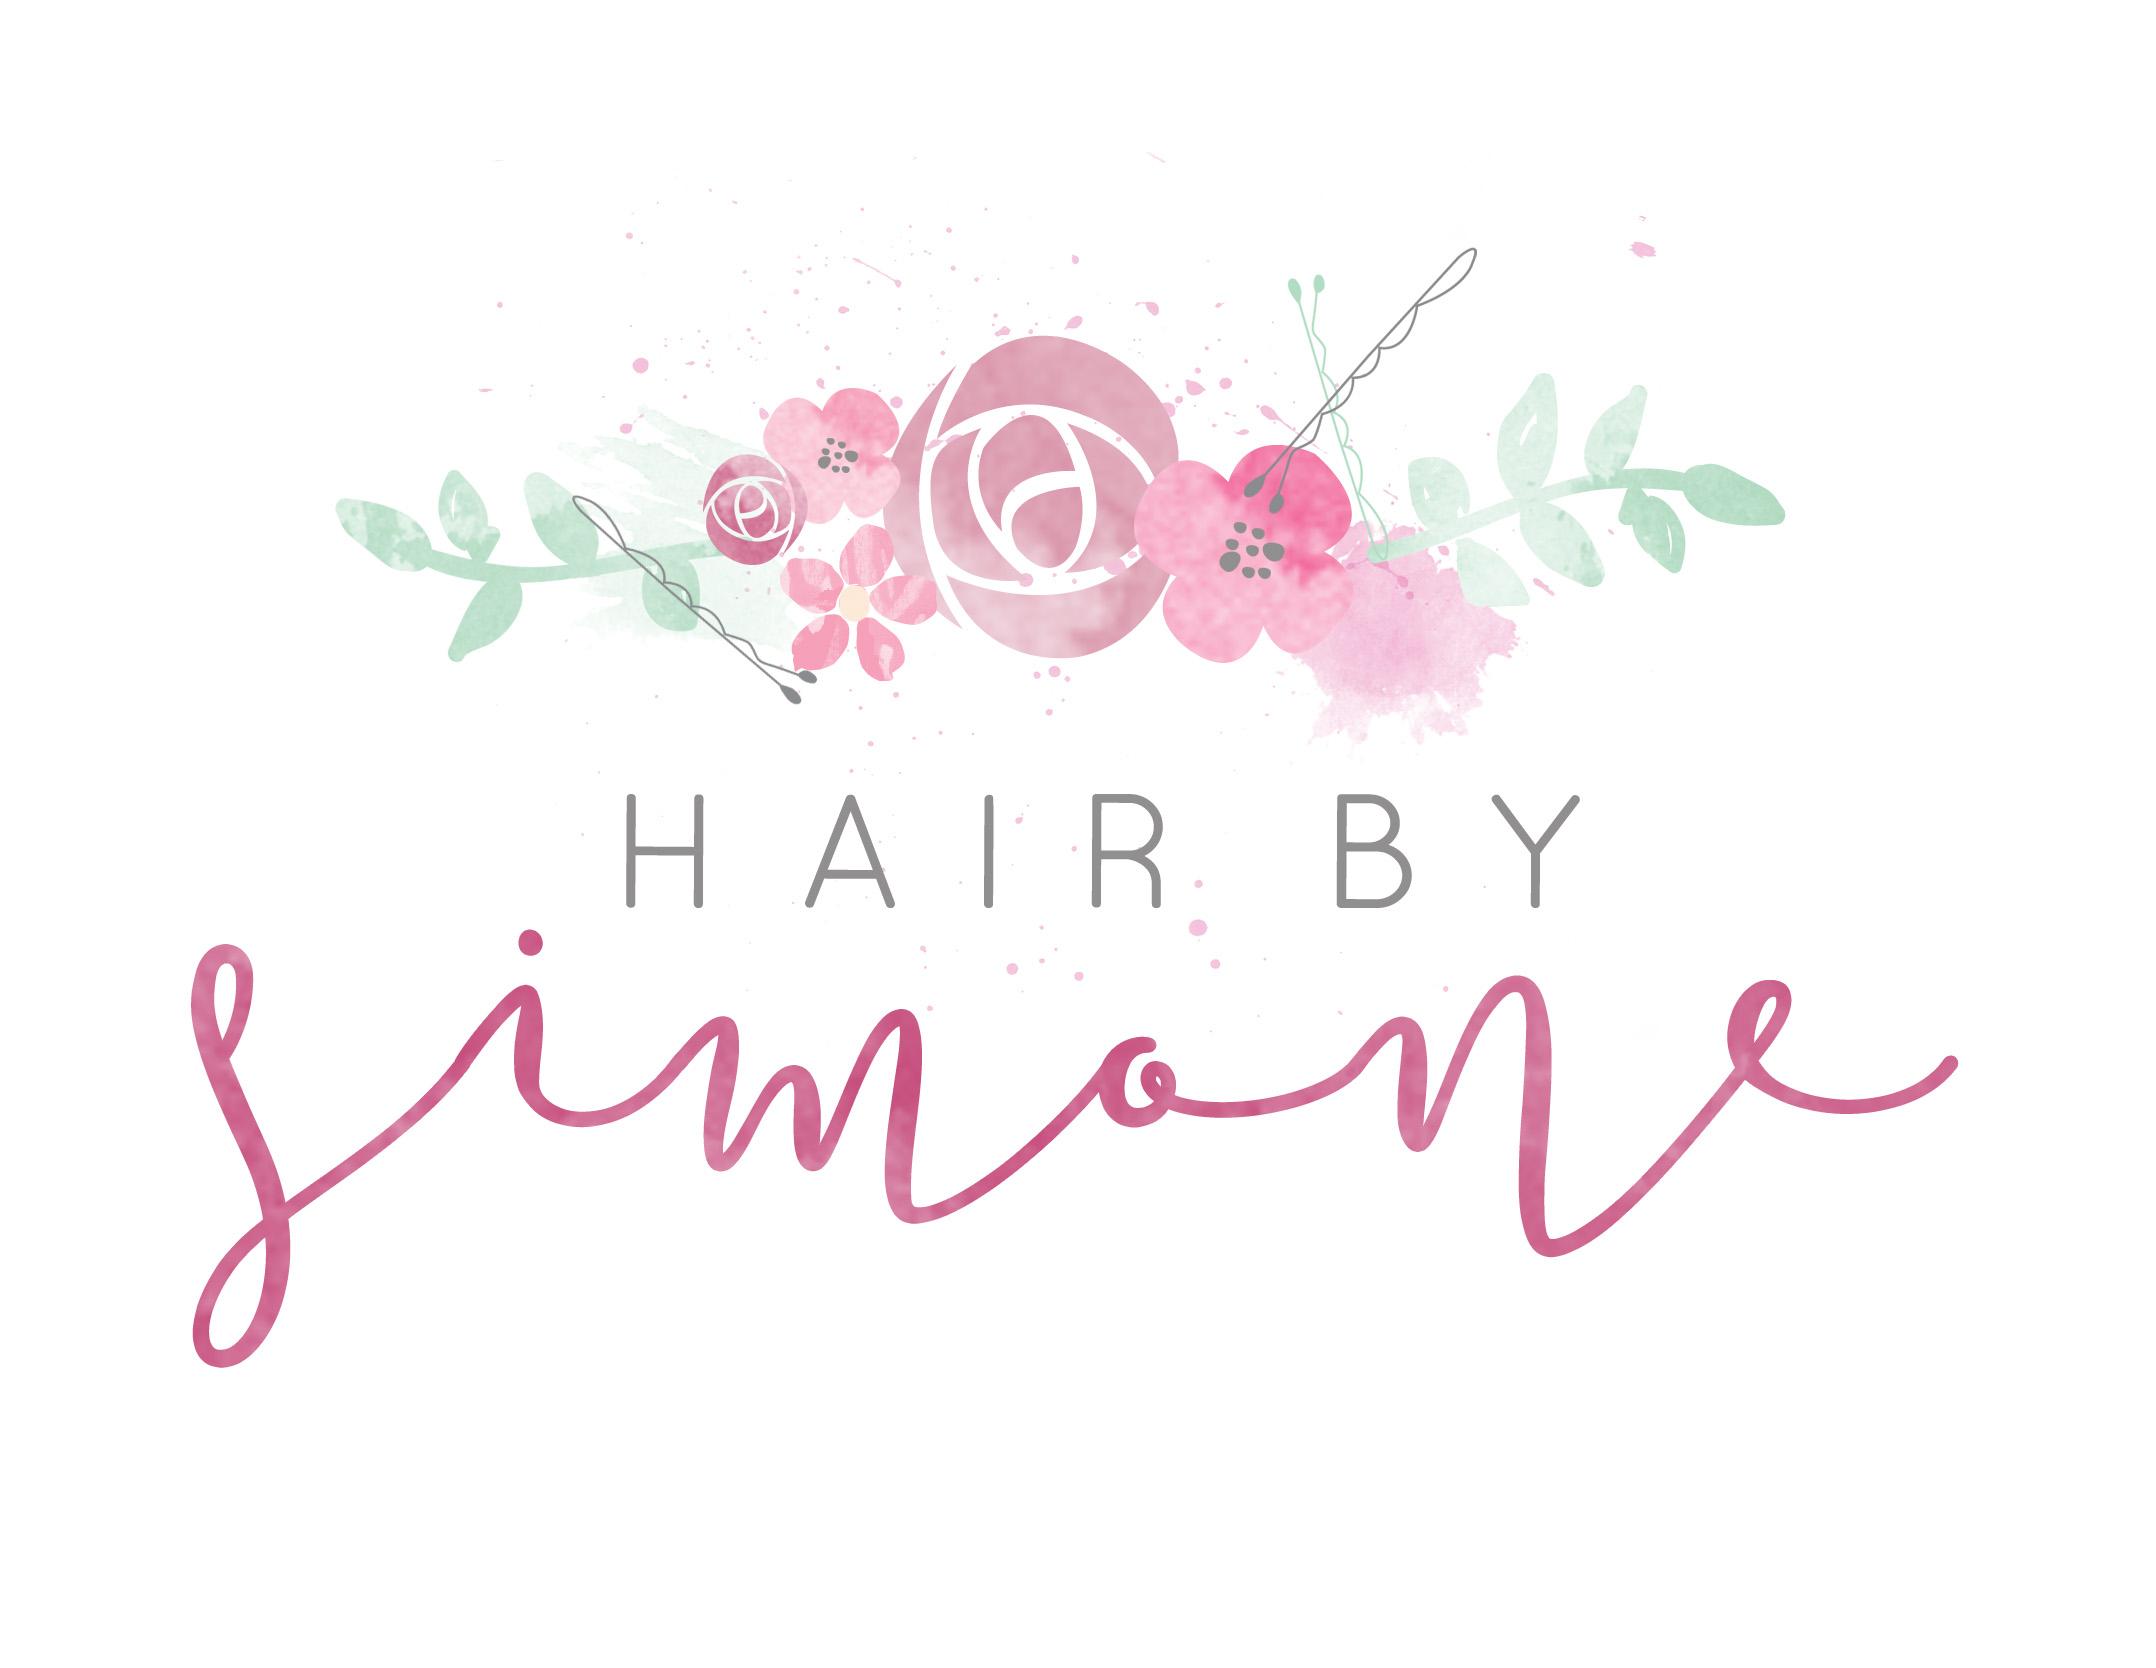 hairdresser-leopold